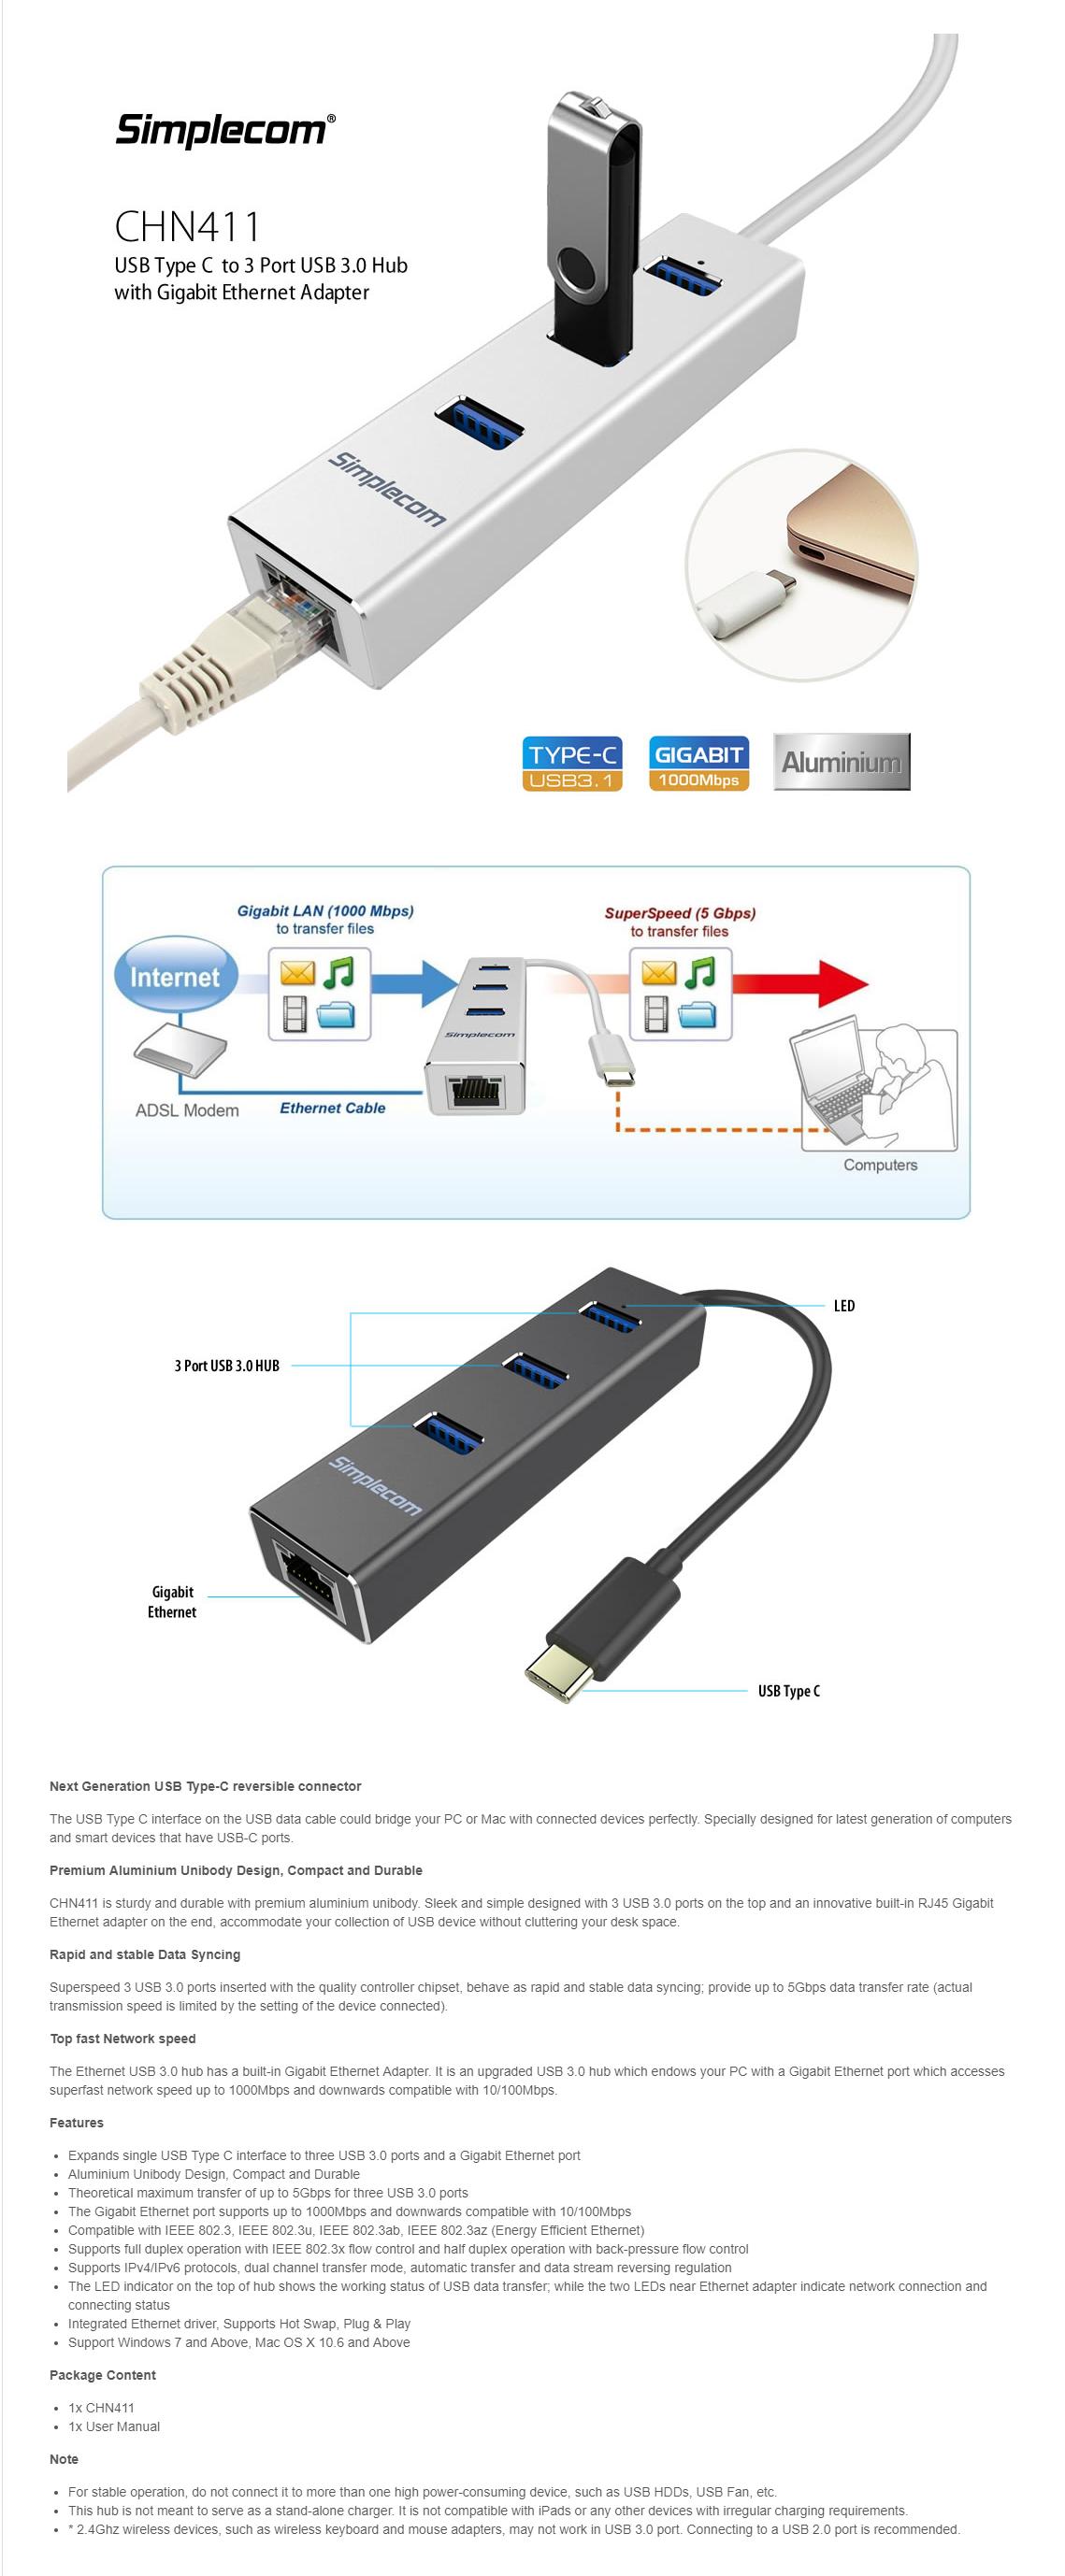 Simplecom CHN411 Aluminium USB Type C to 3 Port USB 3 0 Hub with Gigabit  Ethernet Adapter